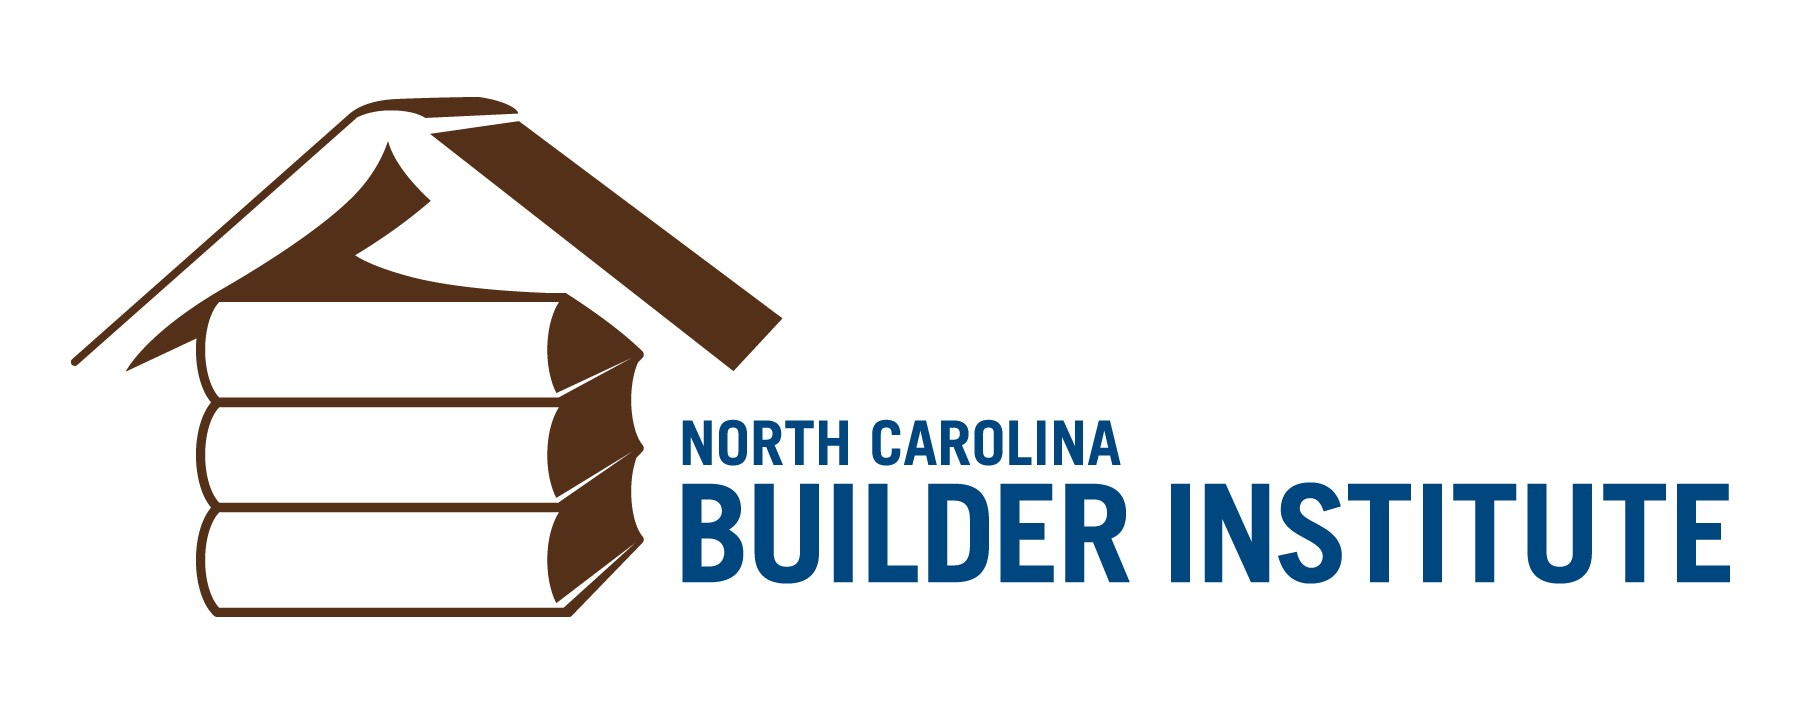 Congratulations to Chris Brock and James Cope, Who Recently Received NCBI Designations